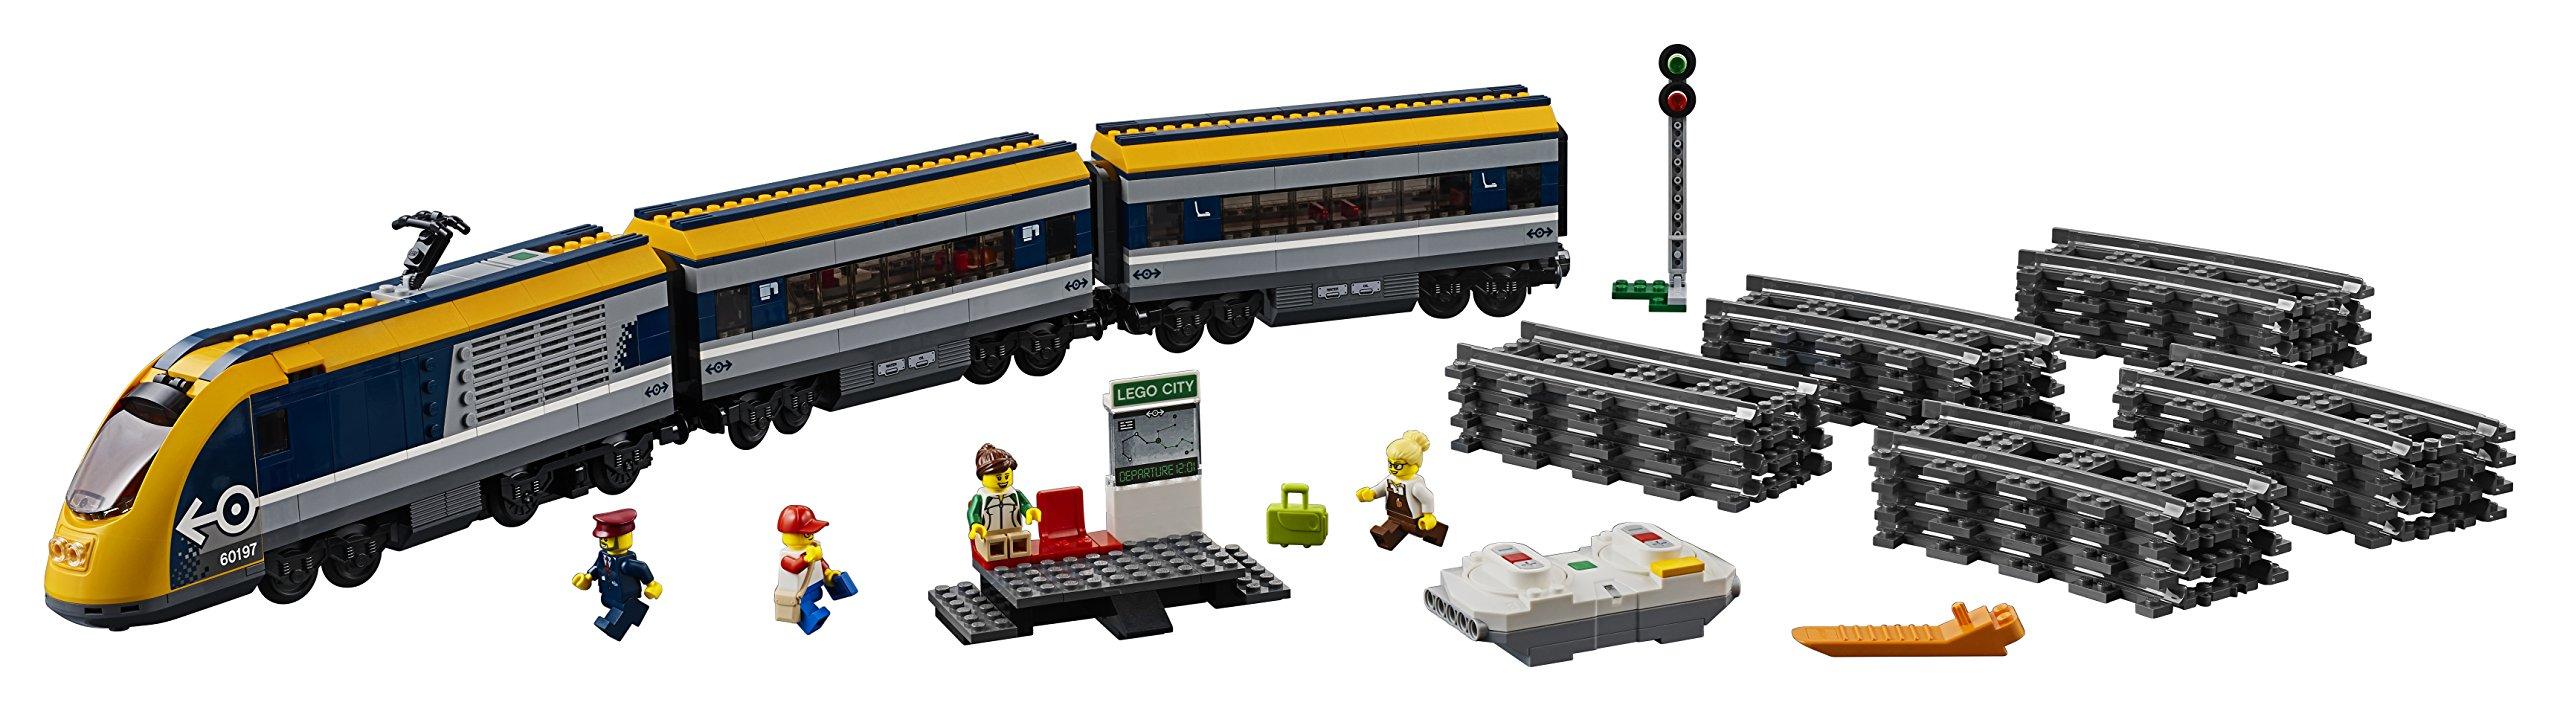 LEGO City - Treno Passeggeri, 60197 4 spesavip